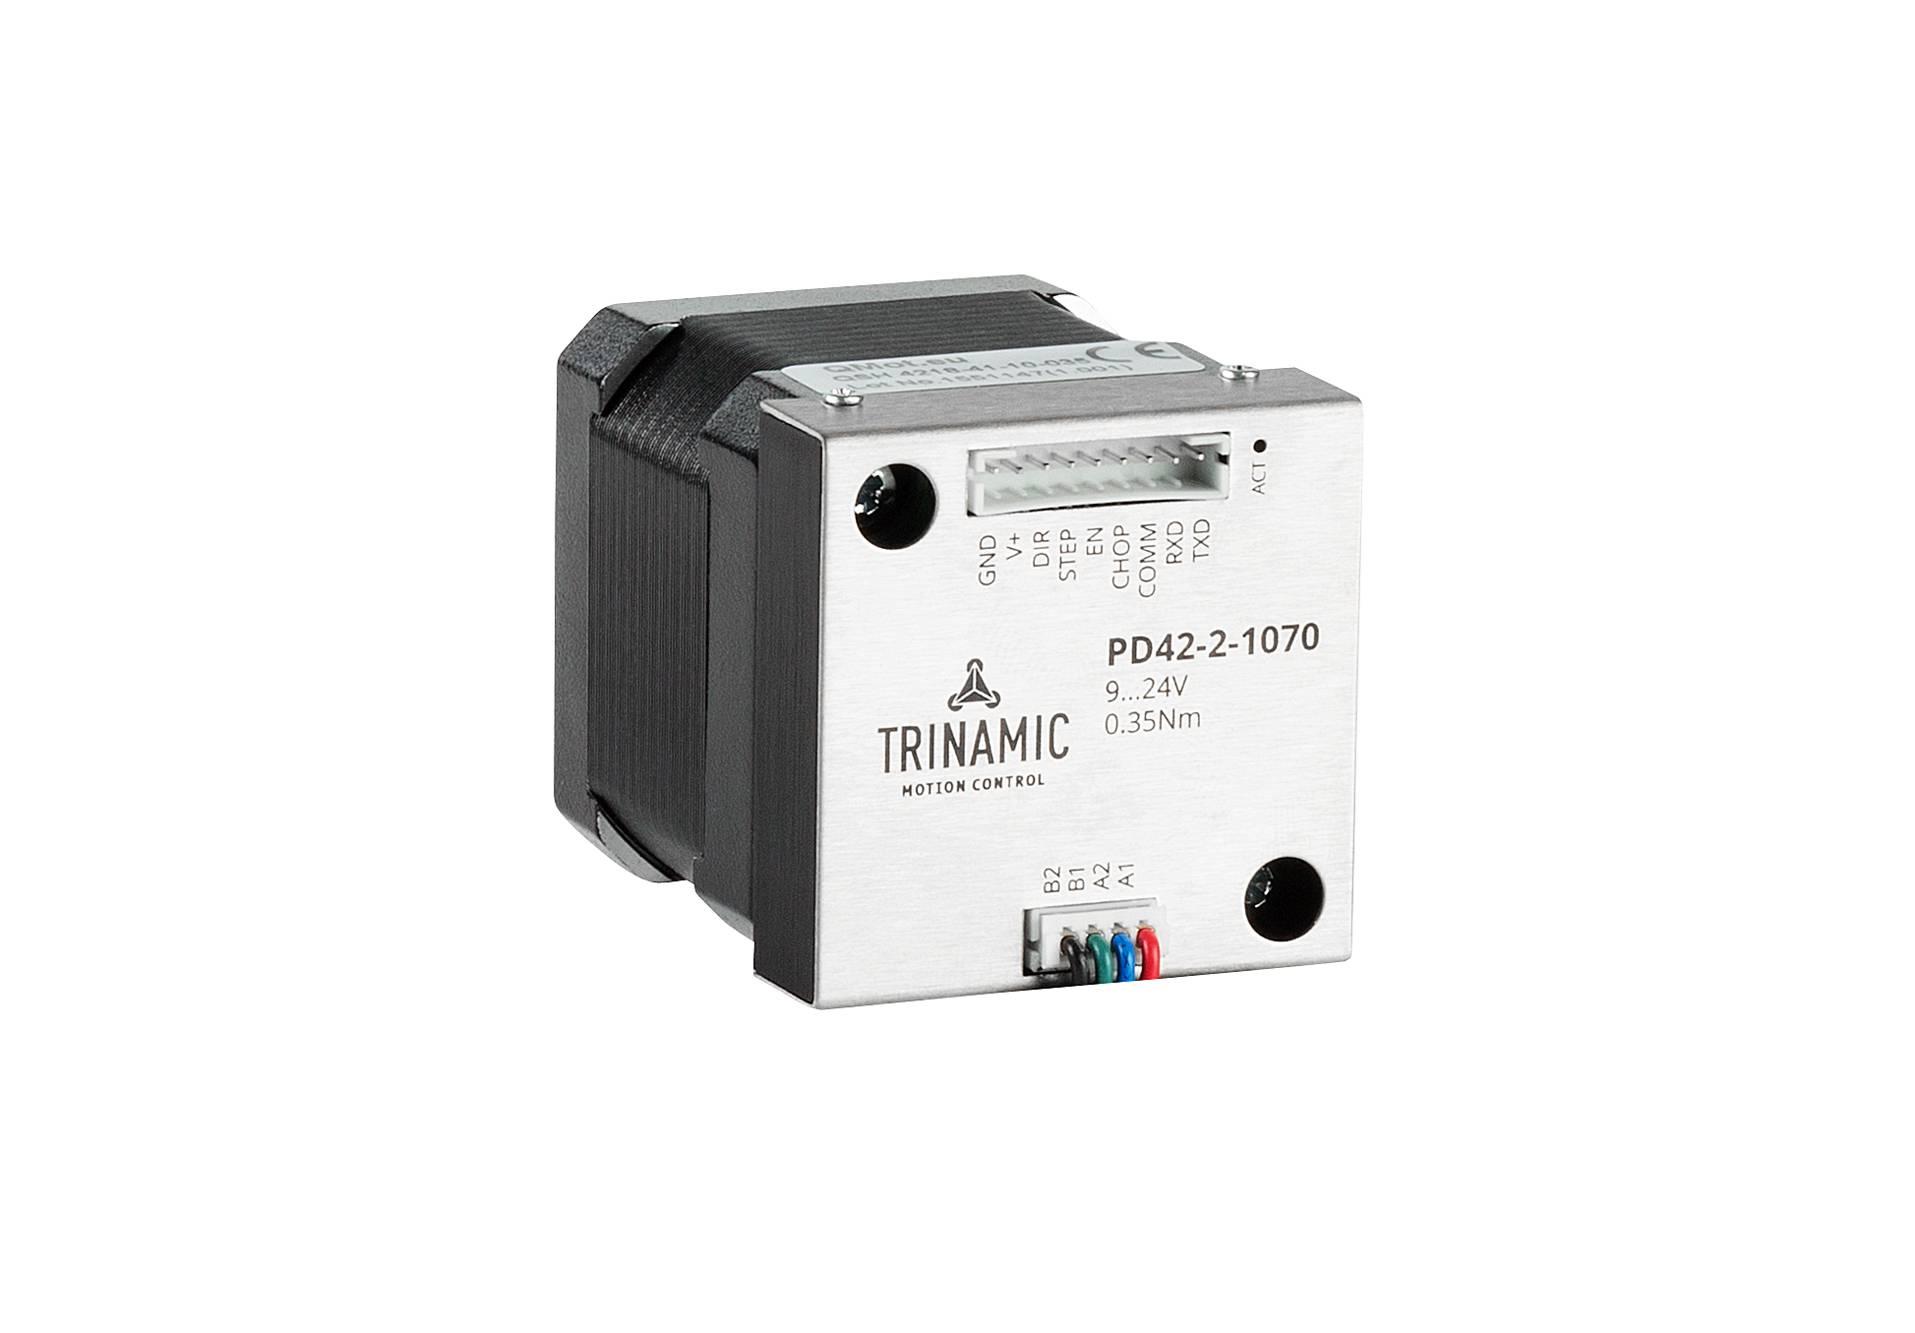 PD42-2-1070